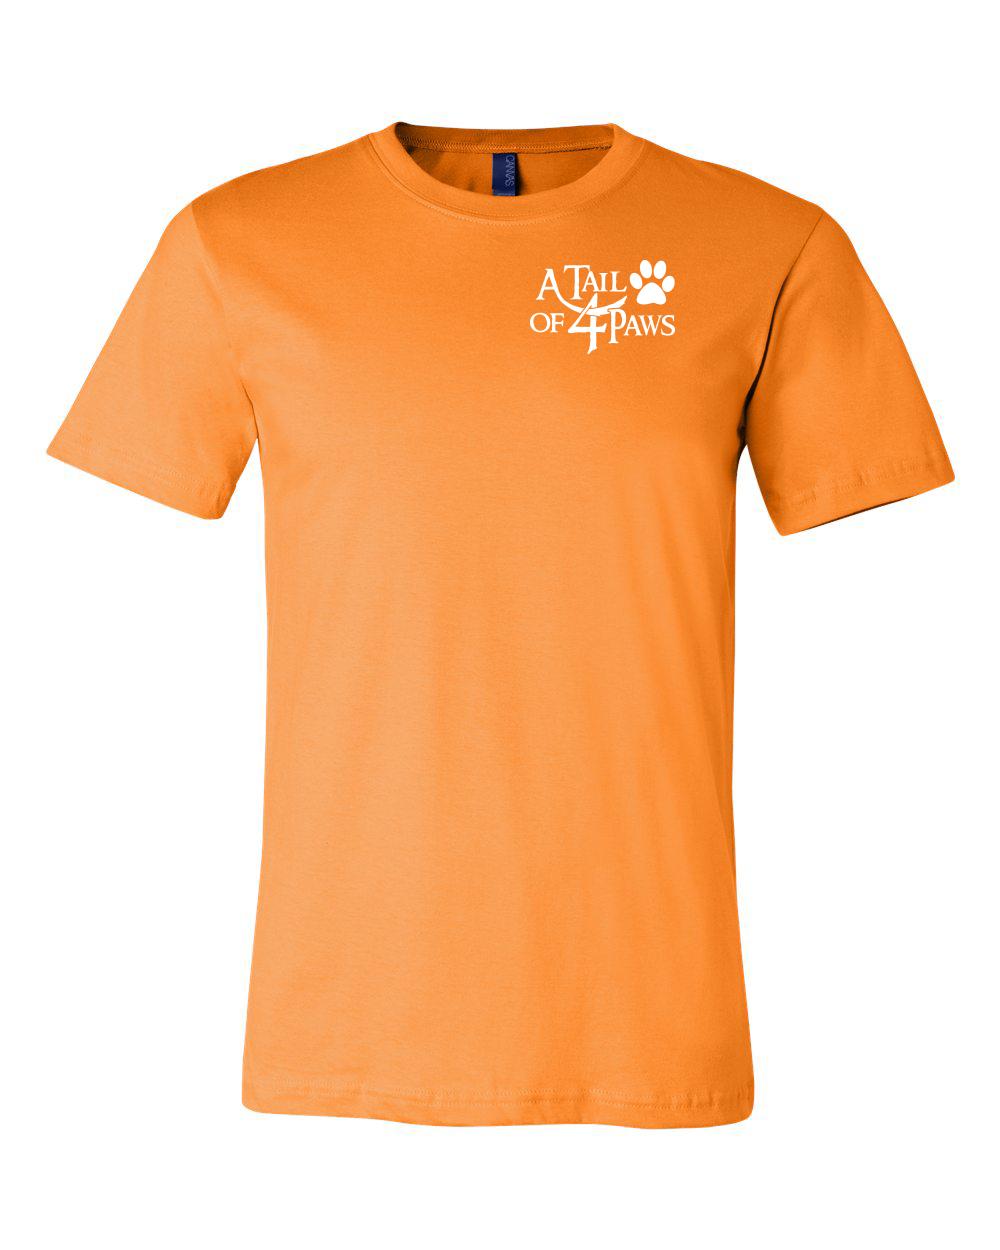 Front of shirt Orange